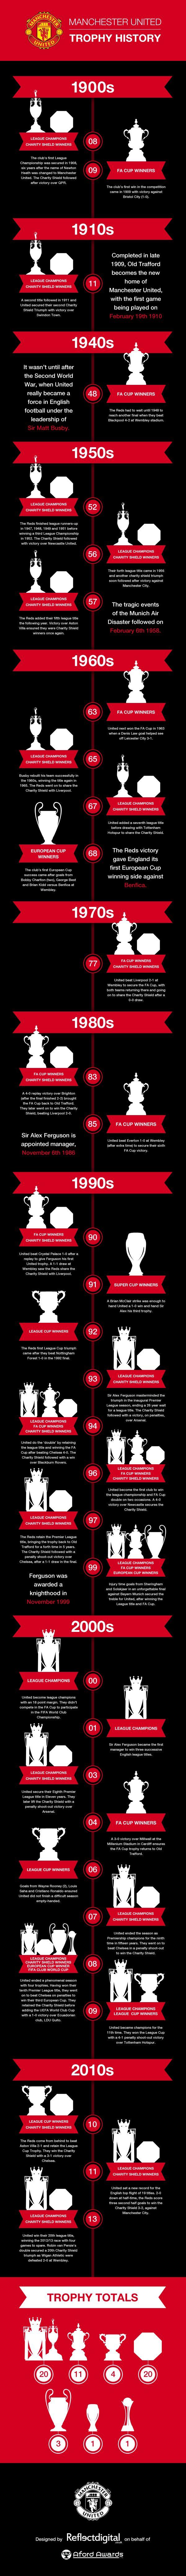 Man Utd Football Trophies